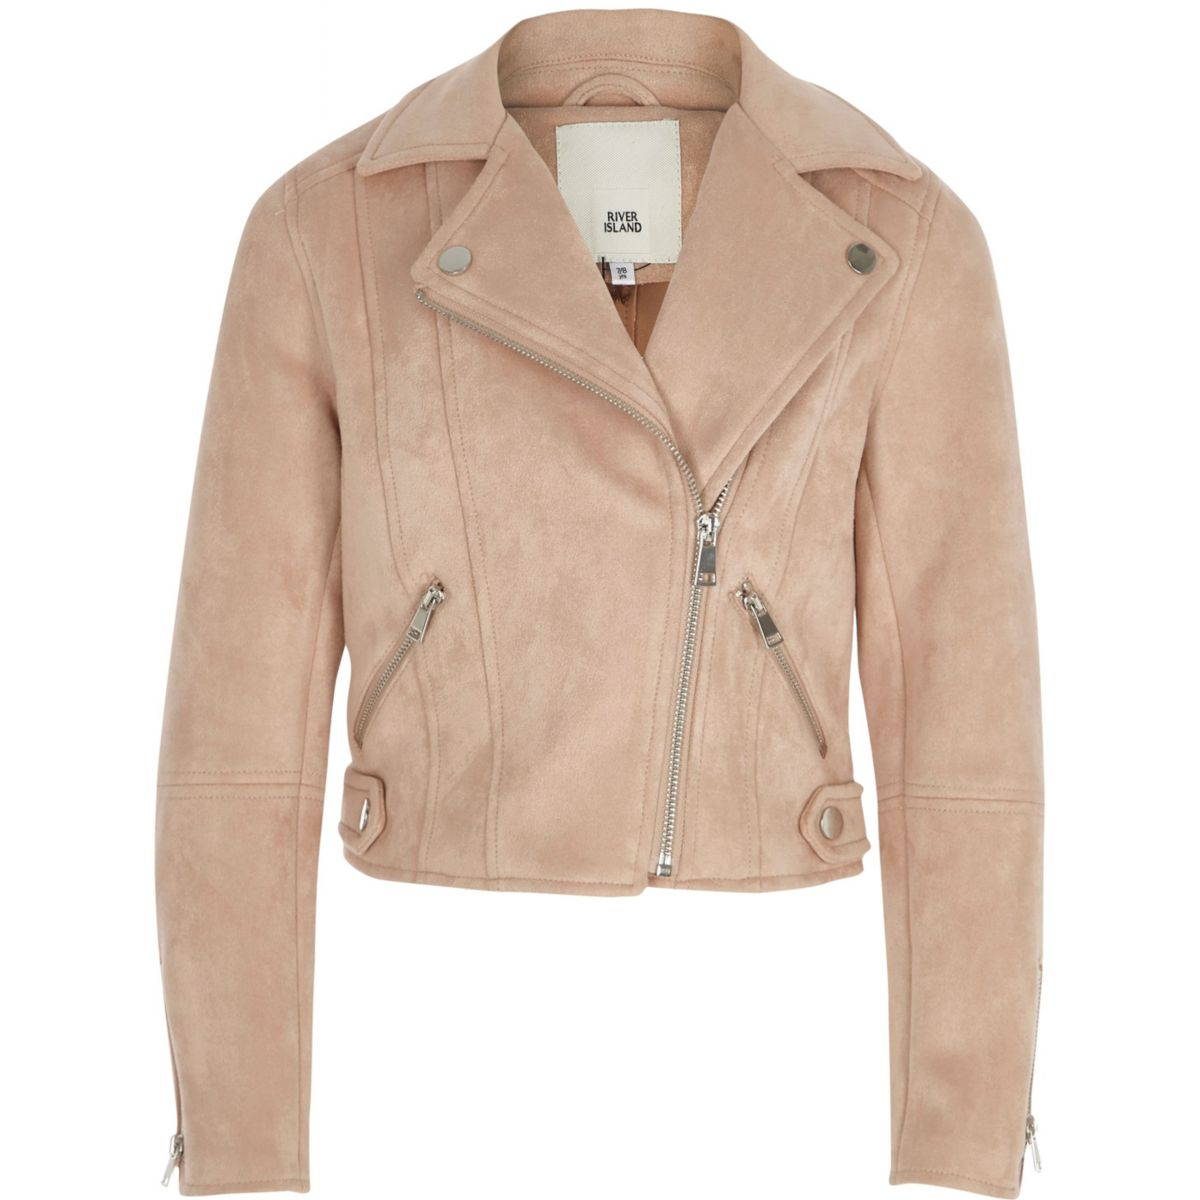 Girls light pink faux suede biker jacket